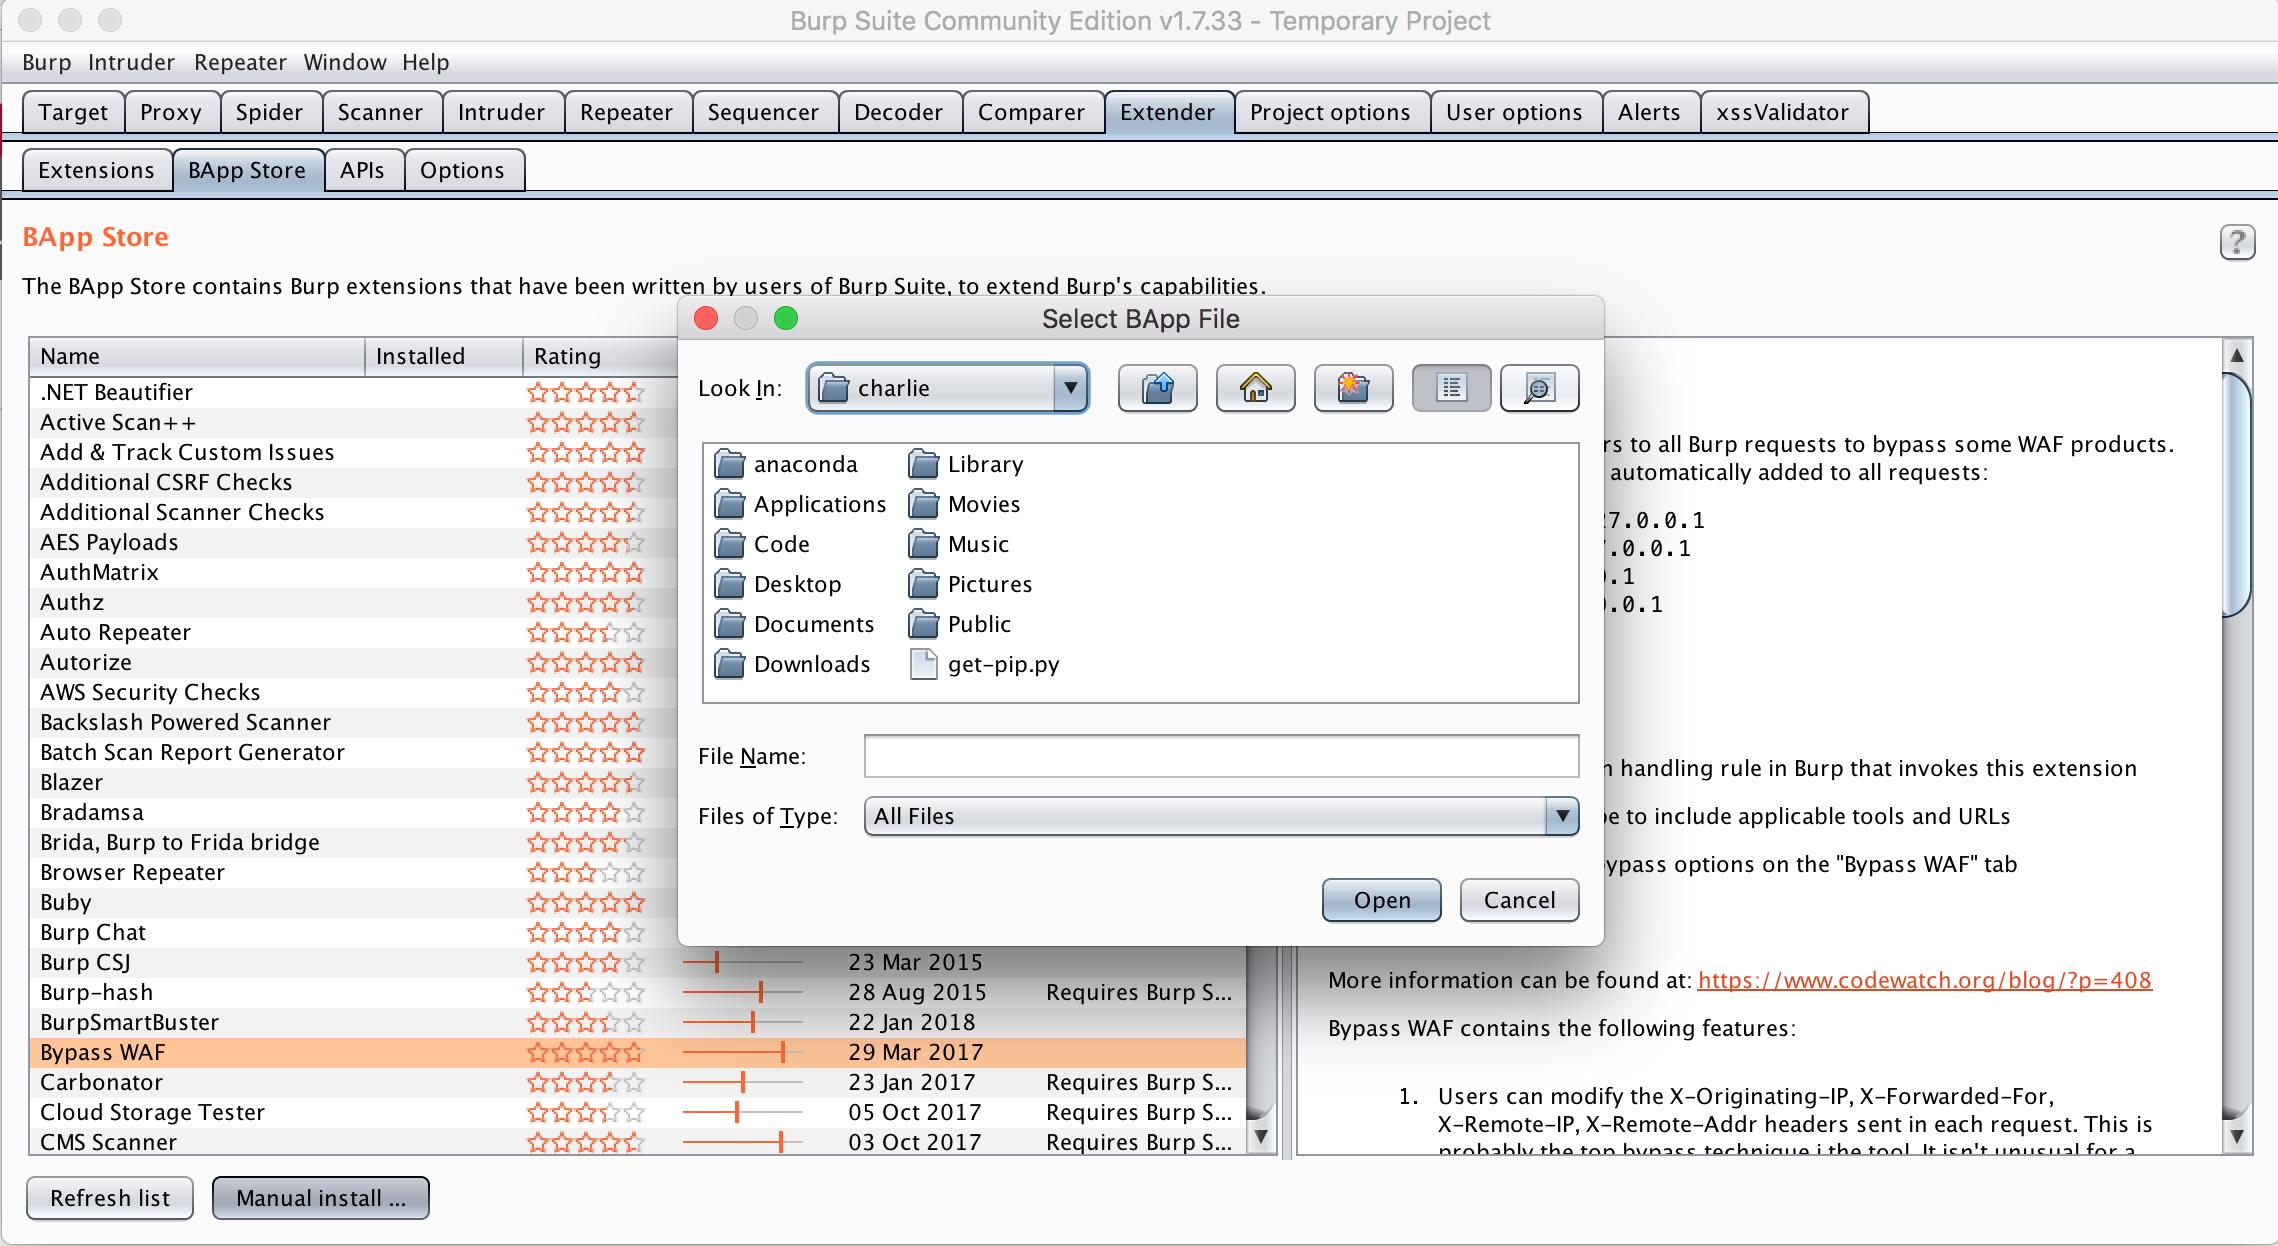 Burp Extensions - Setting up XSS Validator